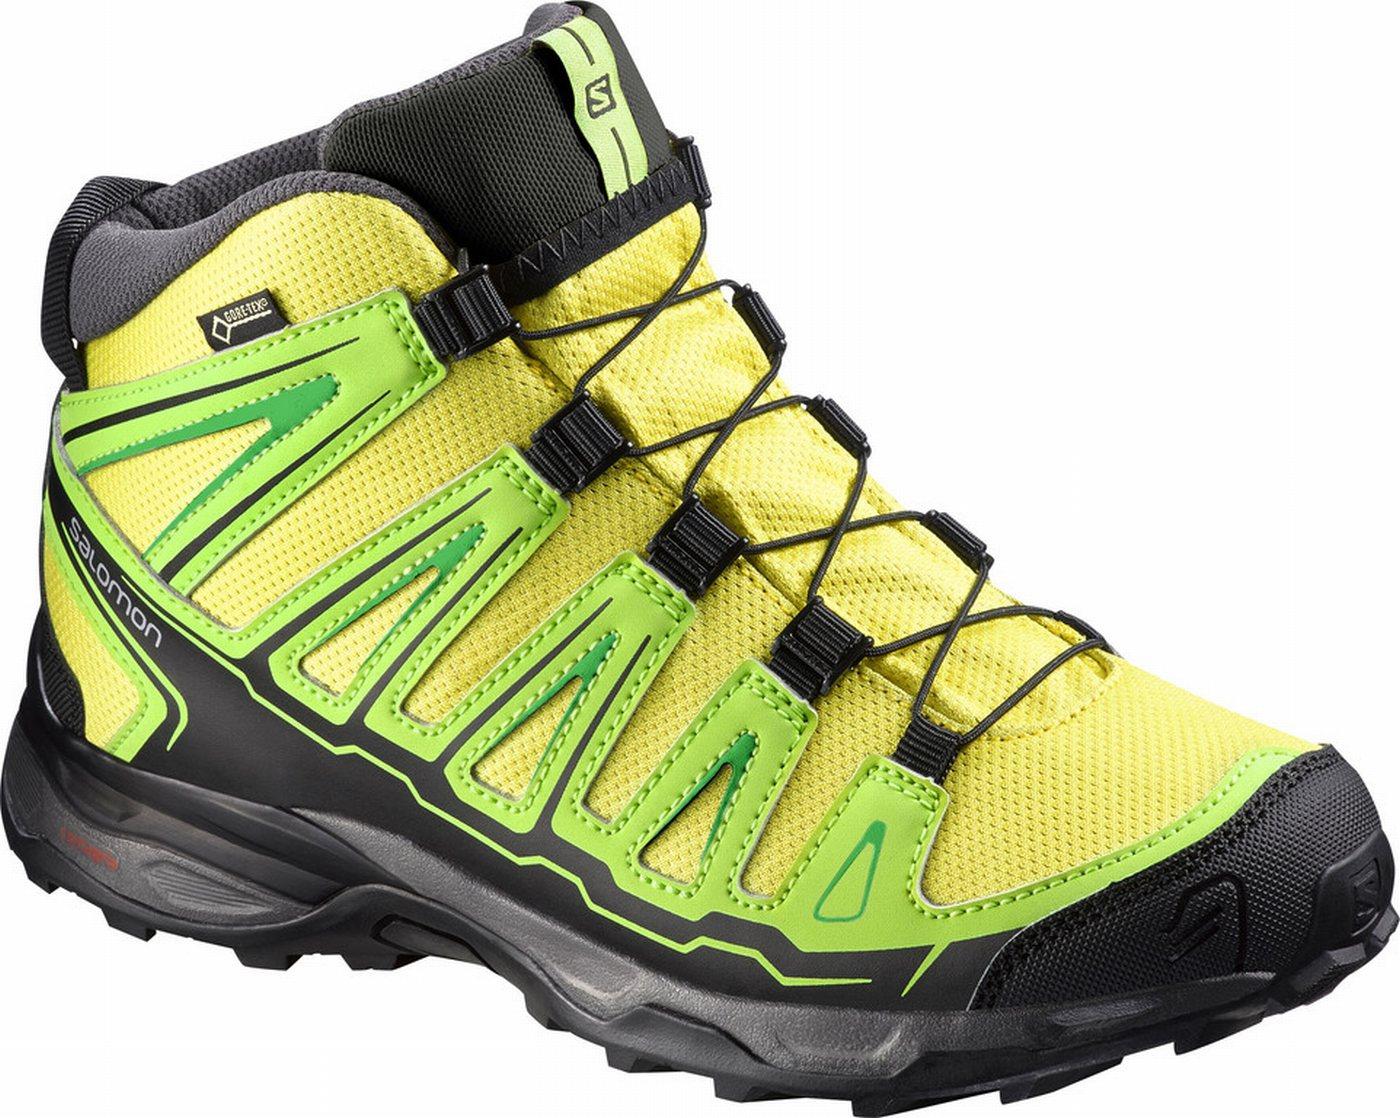 379123_0_X-ULTRA_MID_GTX_J_corona_yellow_granny_green_Junior.thumb